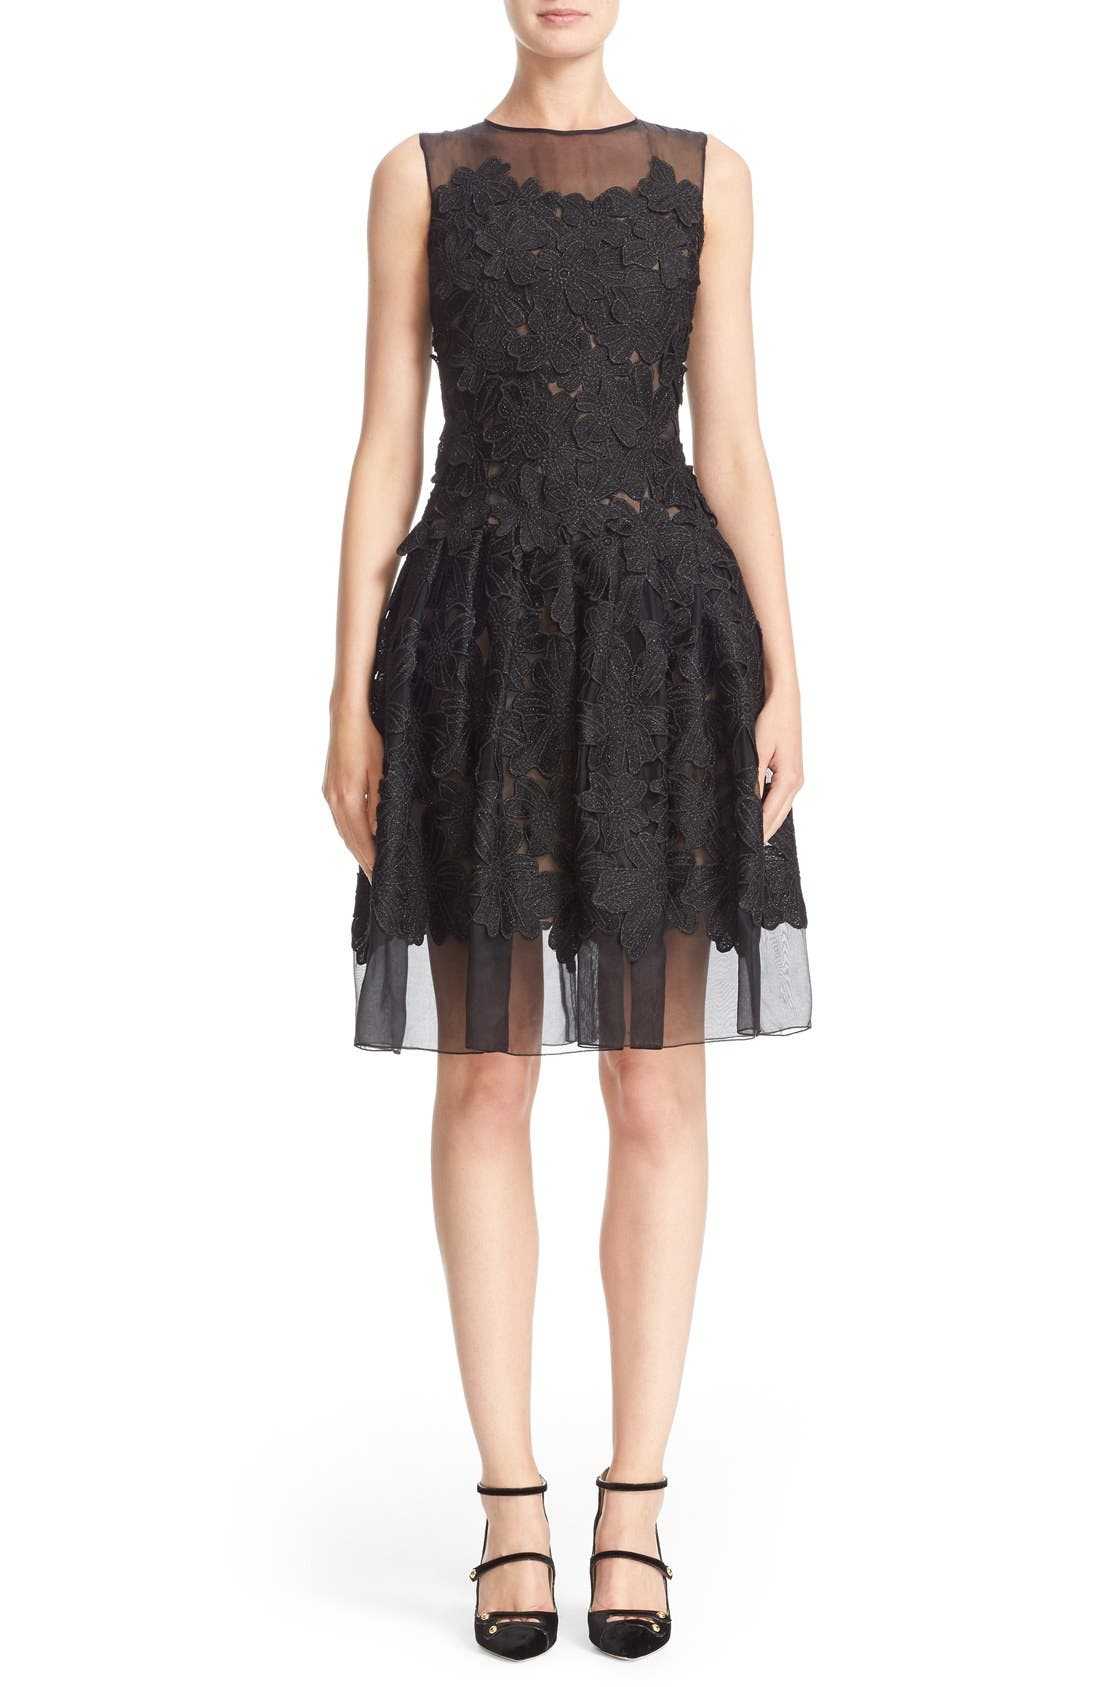 Main Image - Carmen Marc Valvo Couture Floral Appliqué Sleeveless Organza Dress